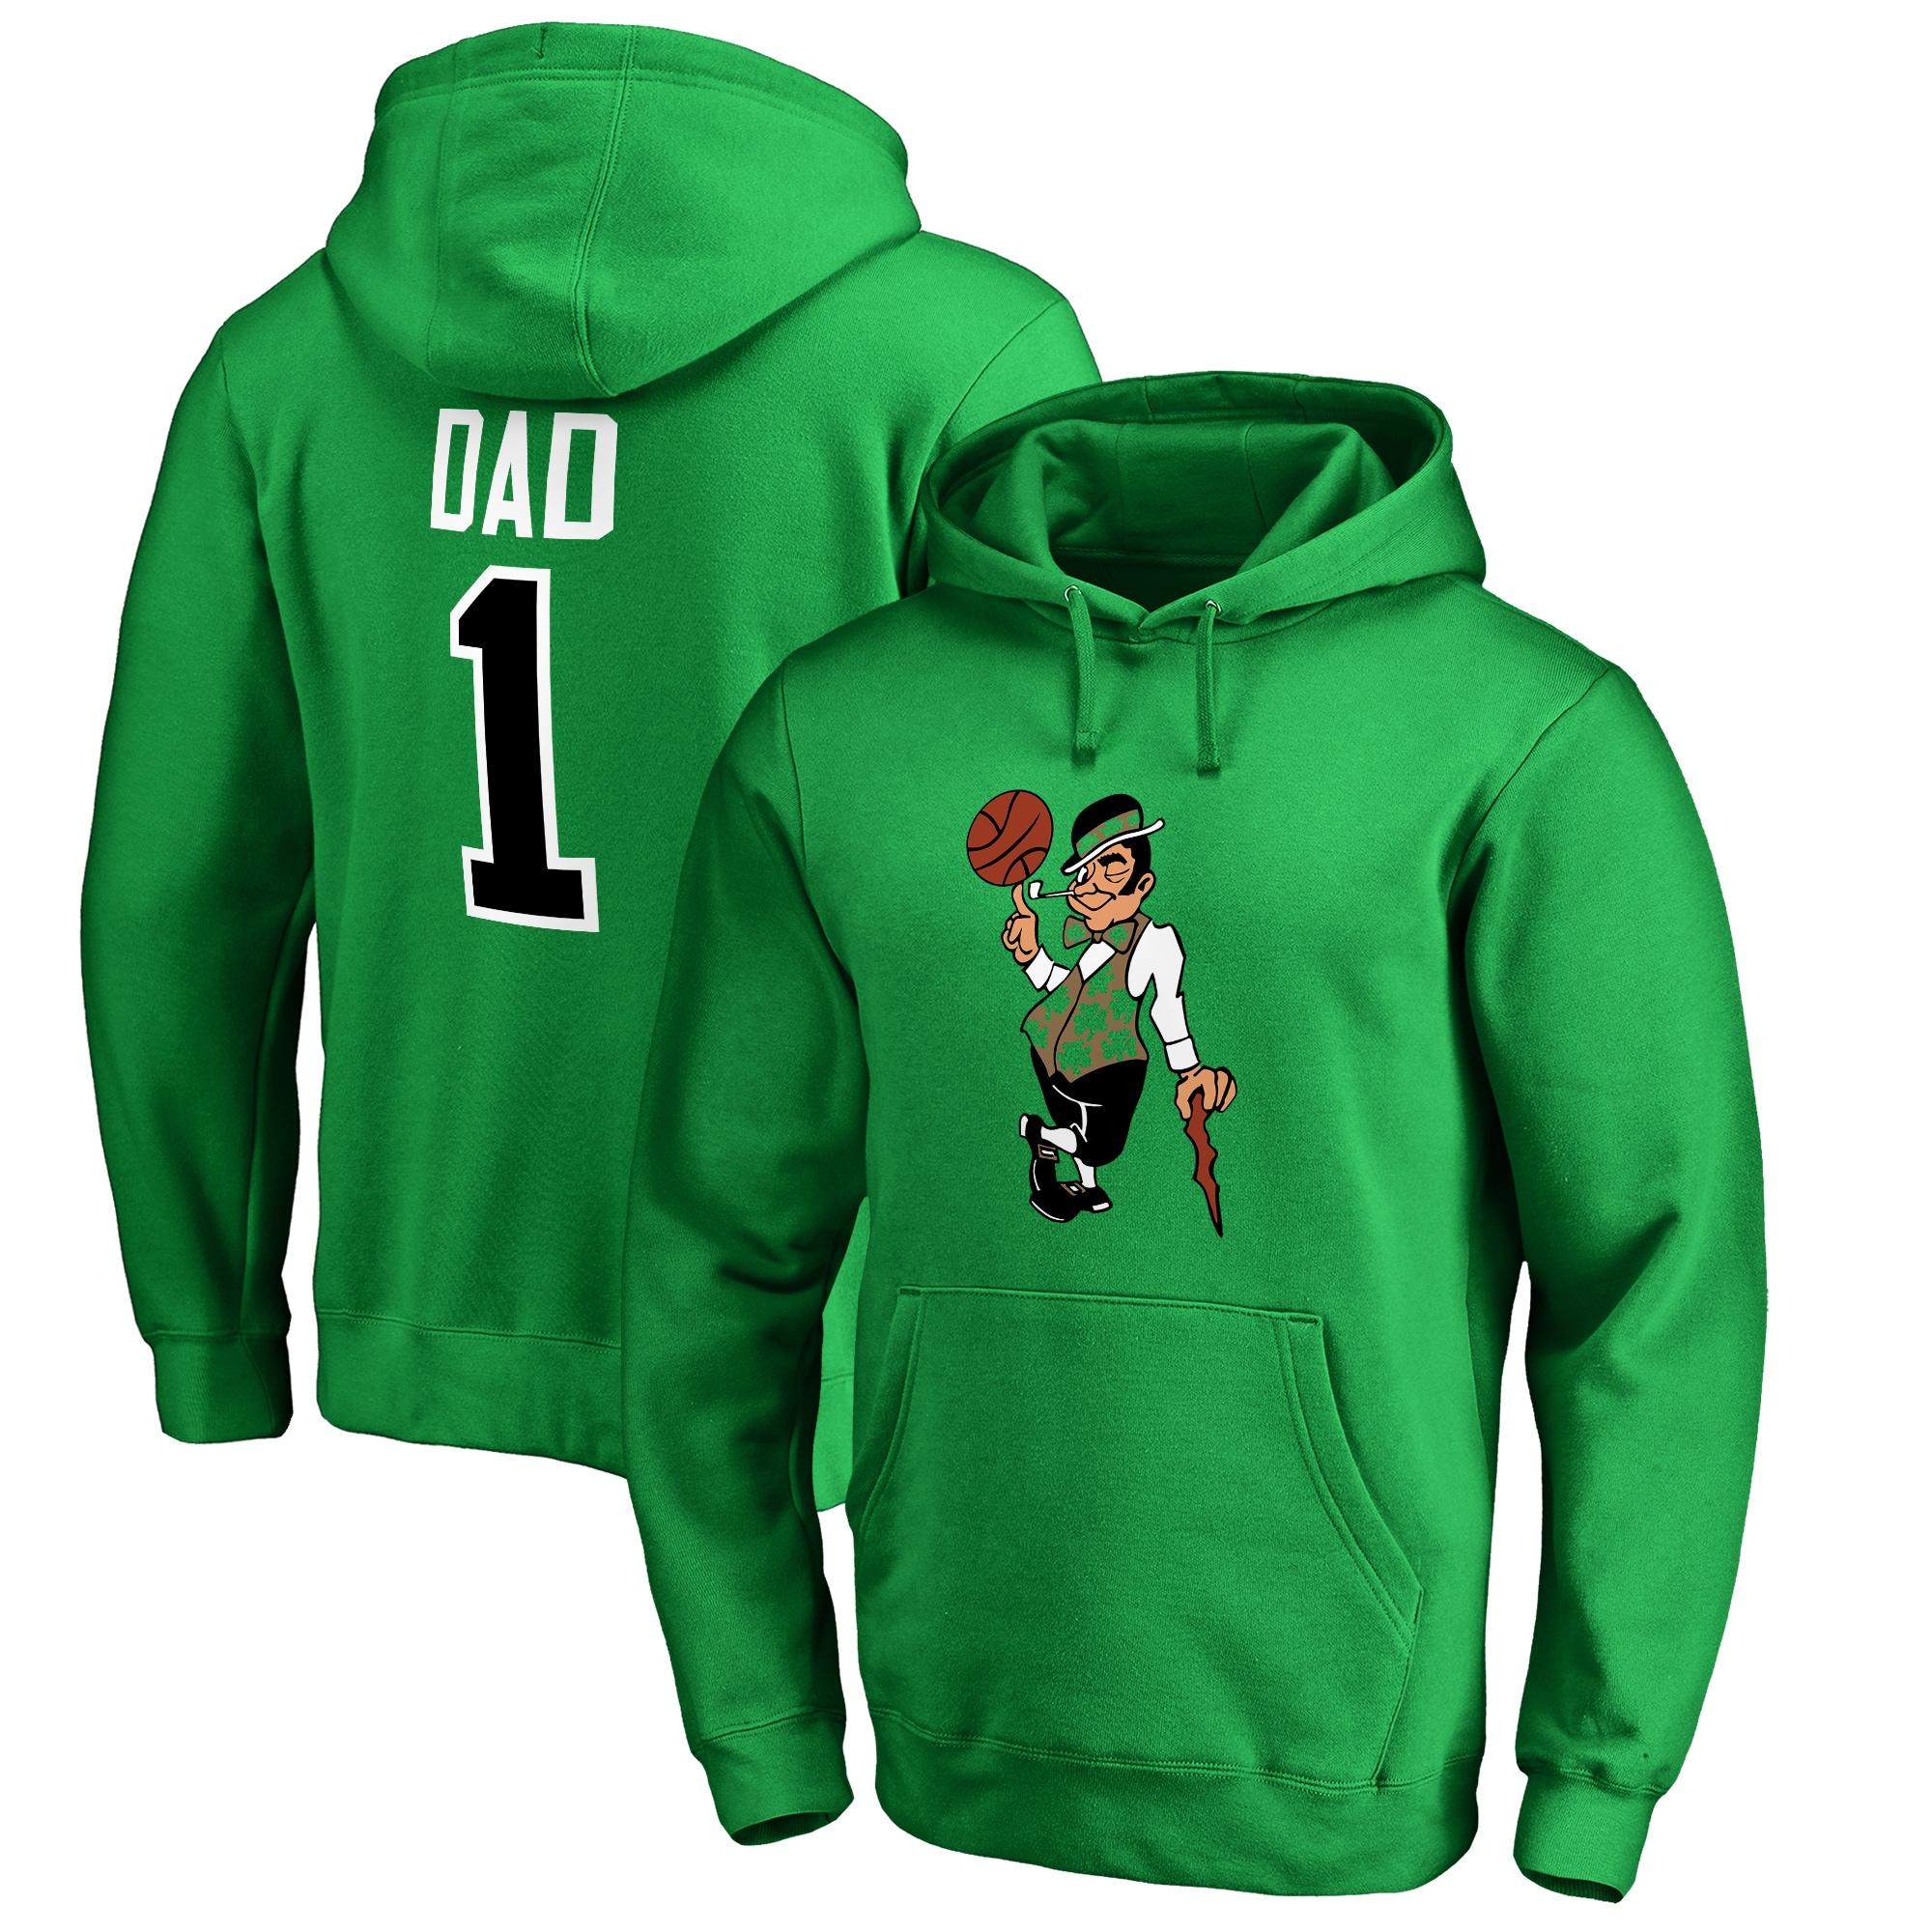 Boston Celtics #1 Dad Pullover Hoodie - Kelly Green